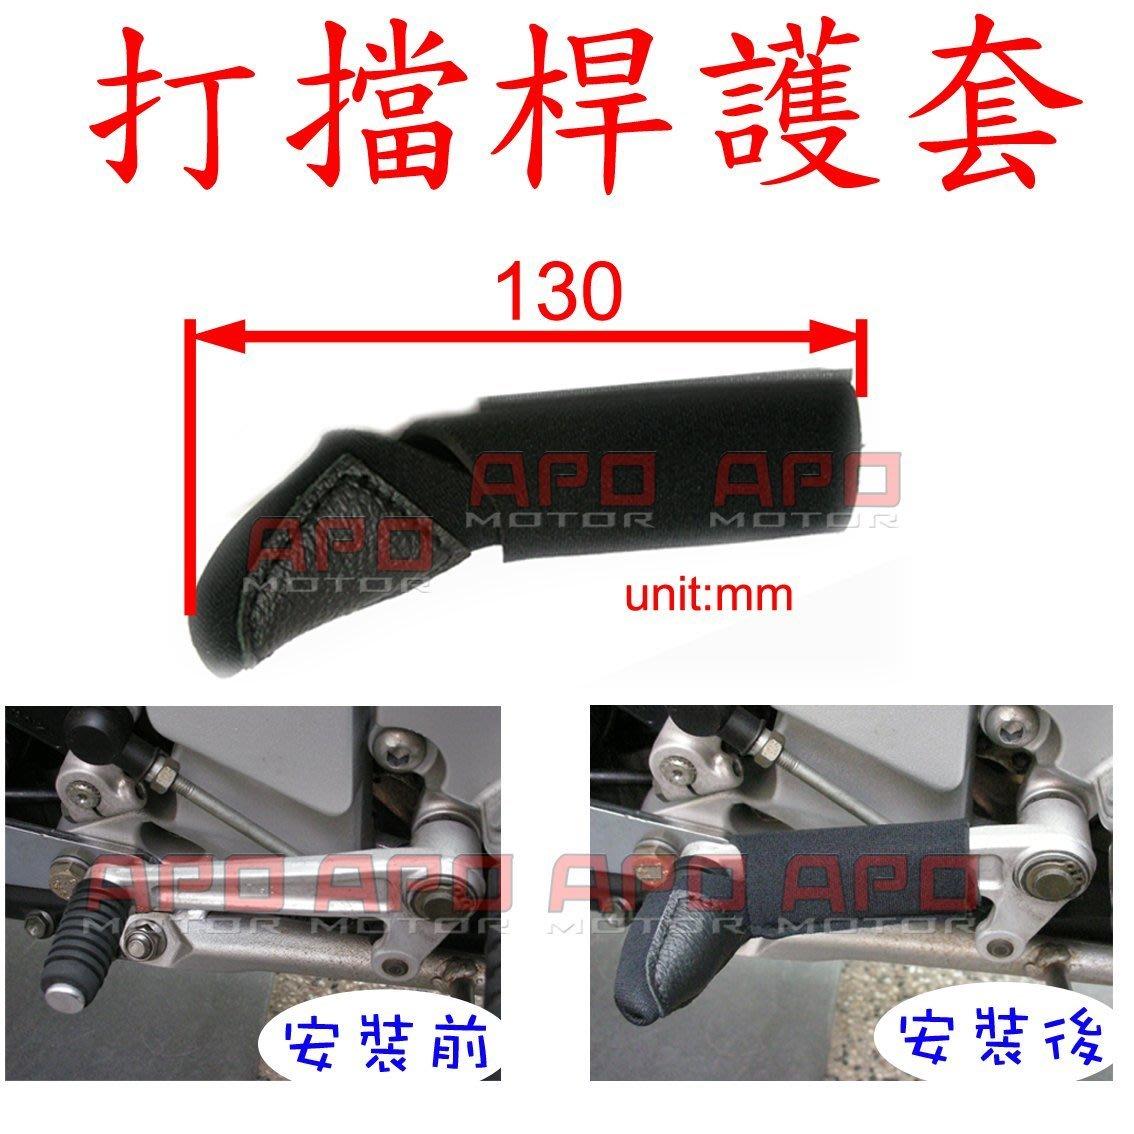 APO~E7-2~5-3打檔桿護套/CBR1000RR/CB400/CB650F/酷龍/KTR/小雲豹/DIABLO